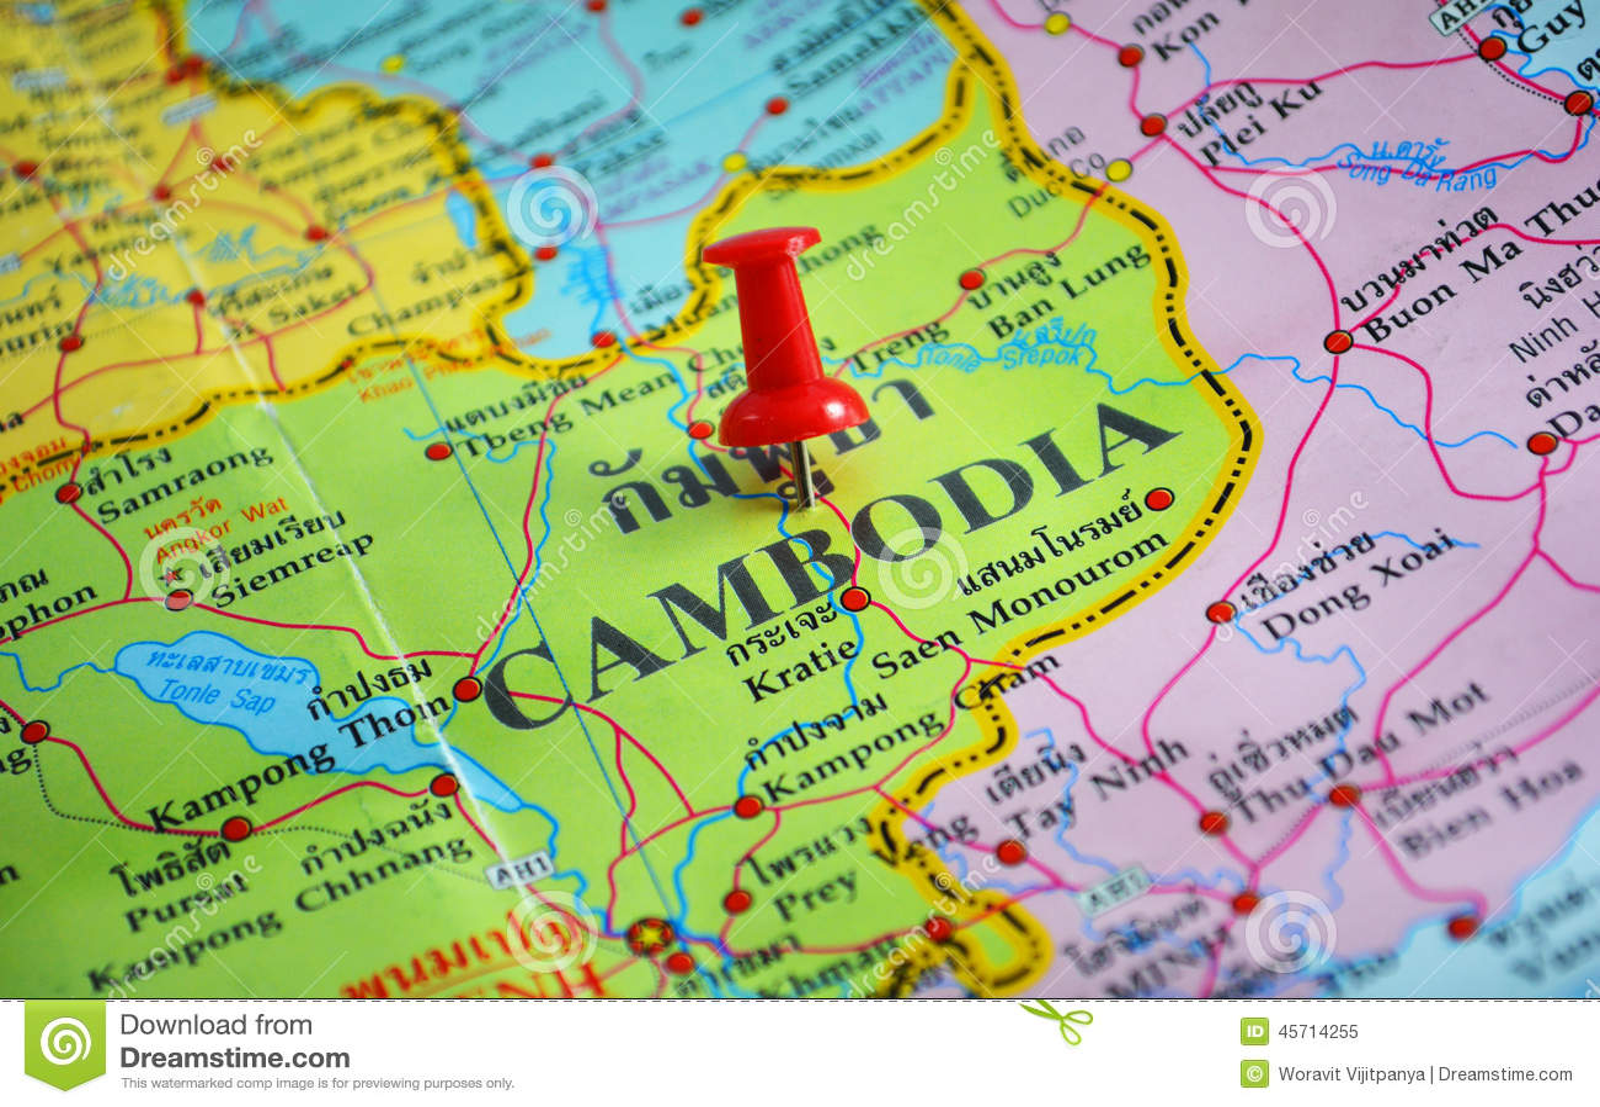 Kambodscha Karte.Kambodscha Karte Stockbild Bild Von Land Makro Tourist